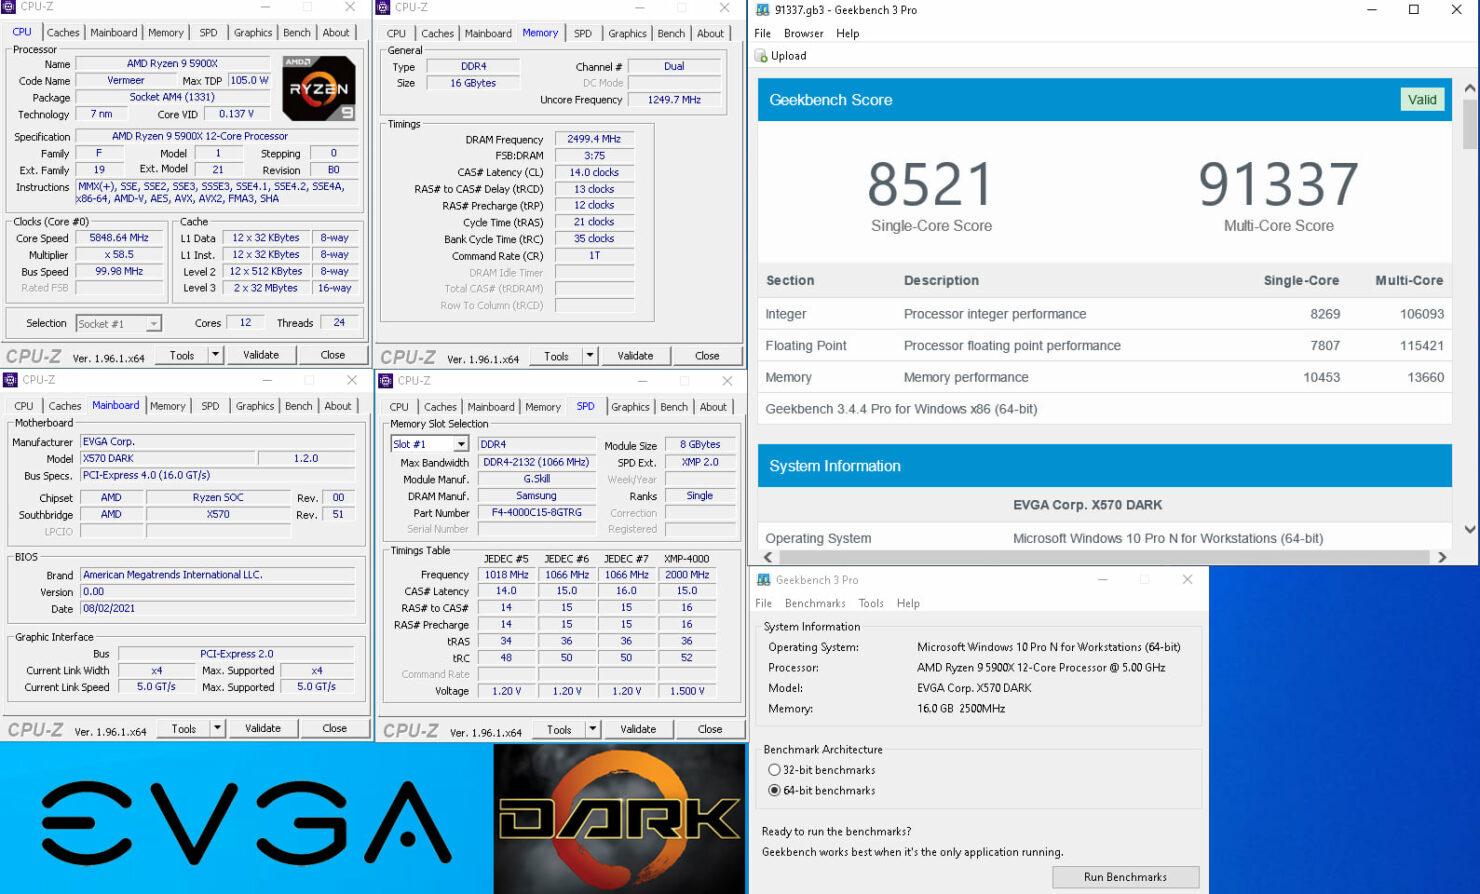 evga-x570-dark-motherboard-_-amd-ryzen-desktop-cpu-overclocking-benchmarks-_2